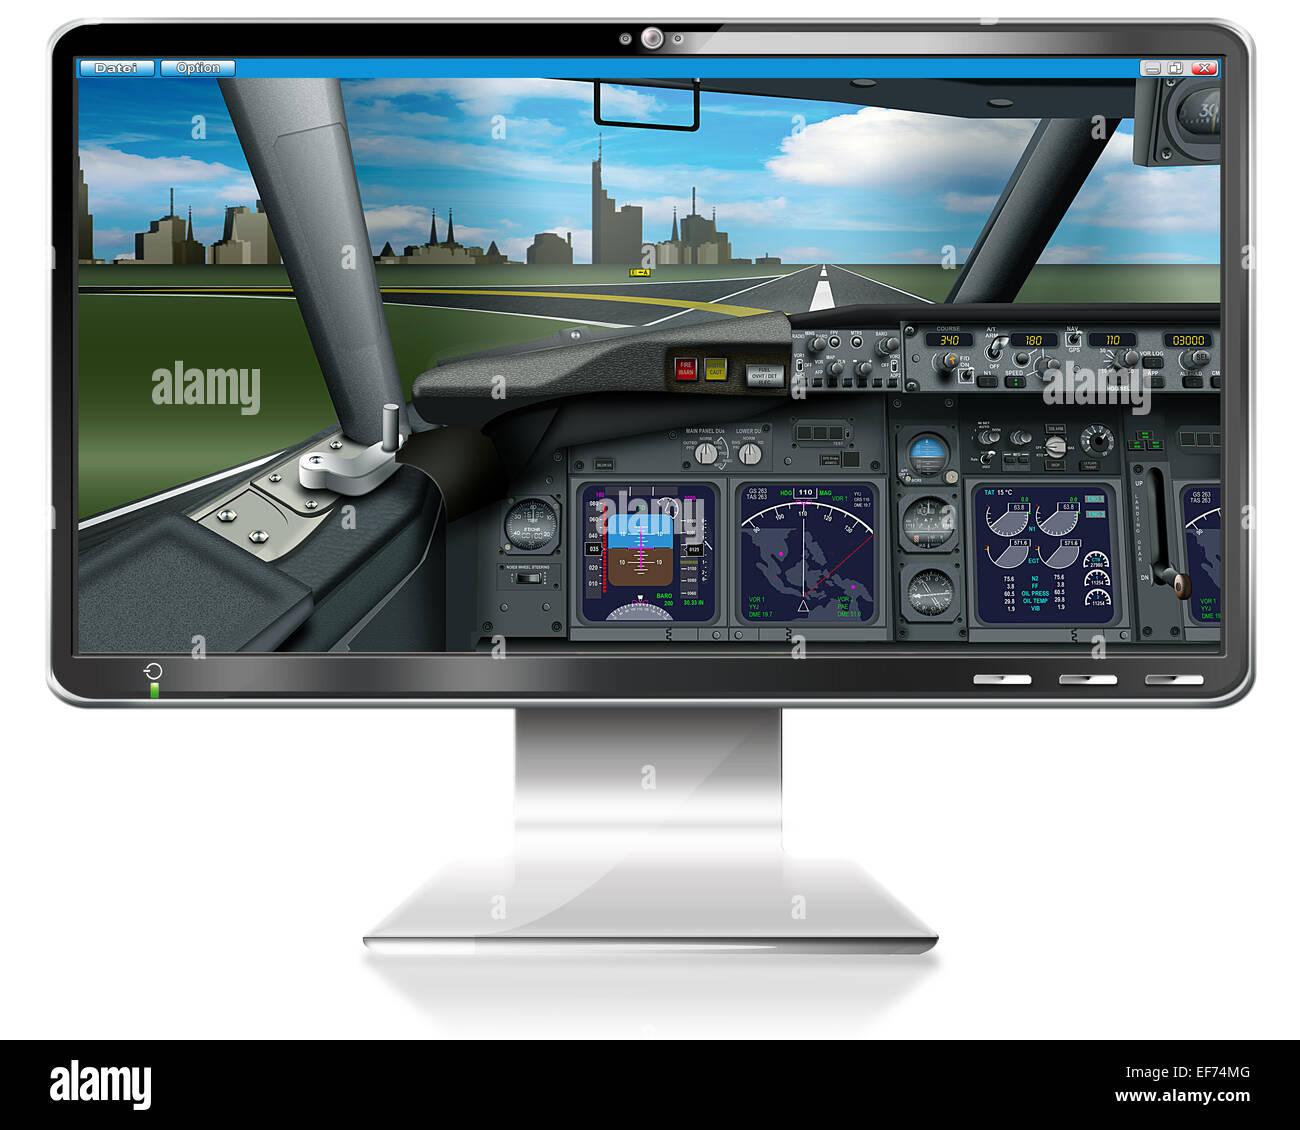 PC game, flight simulator, illustration Stock Photo